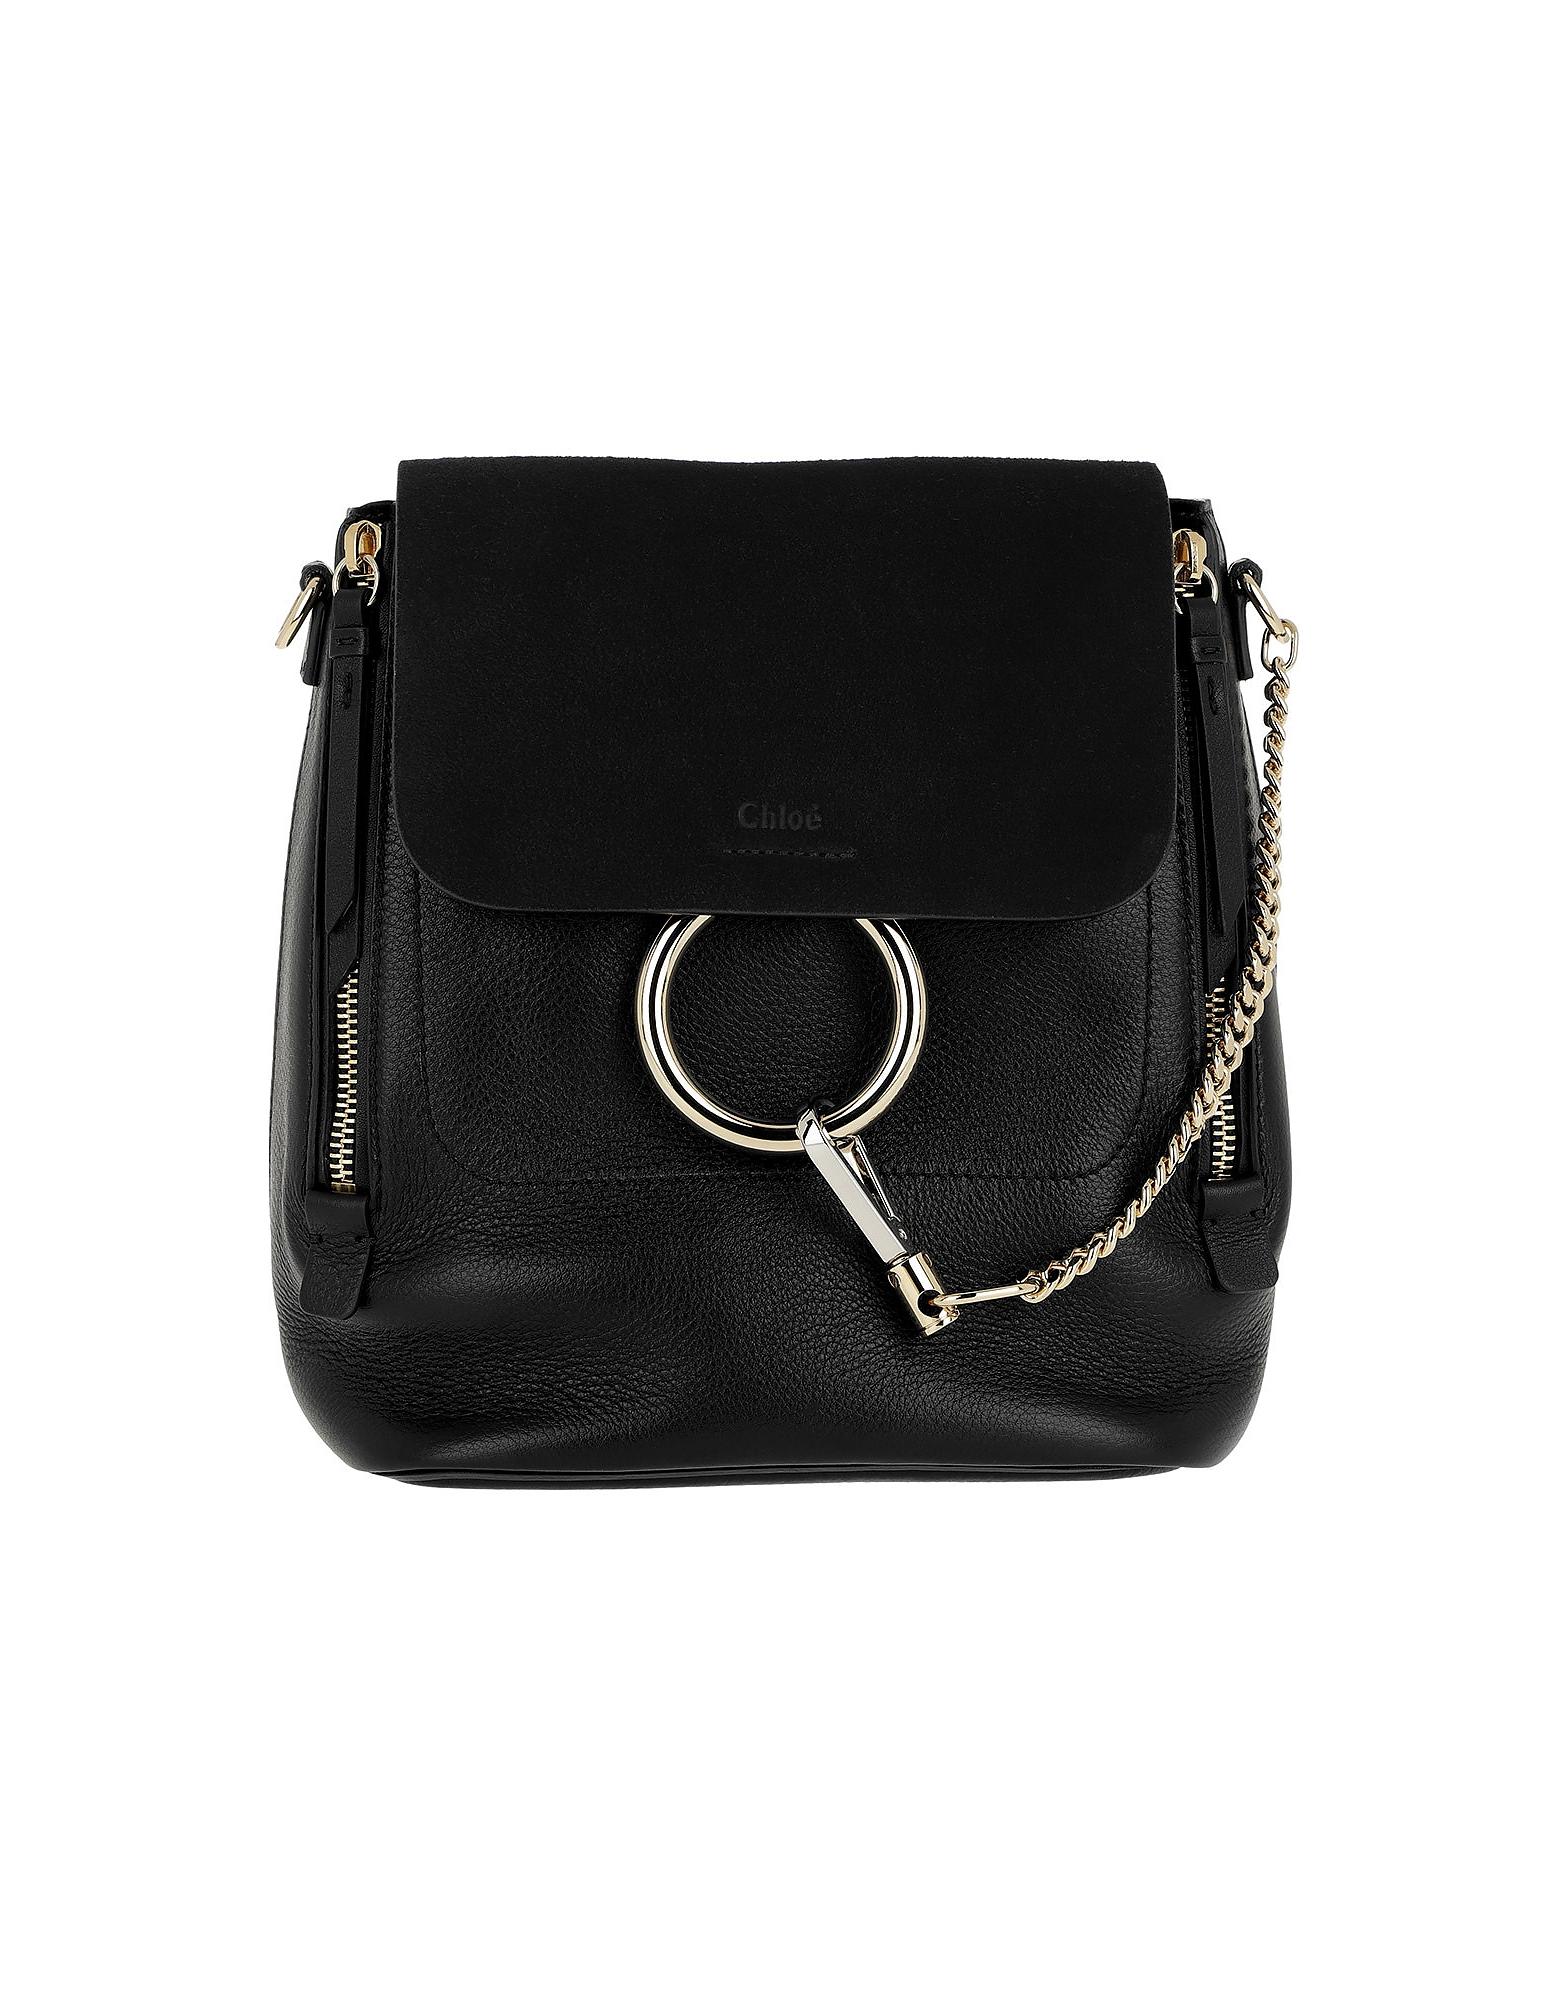 Chloe Handbags, Faye Backpack Small Black